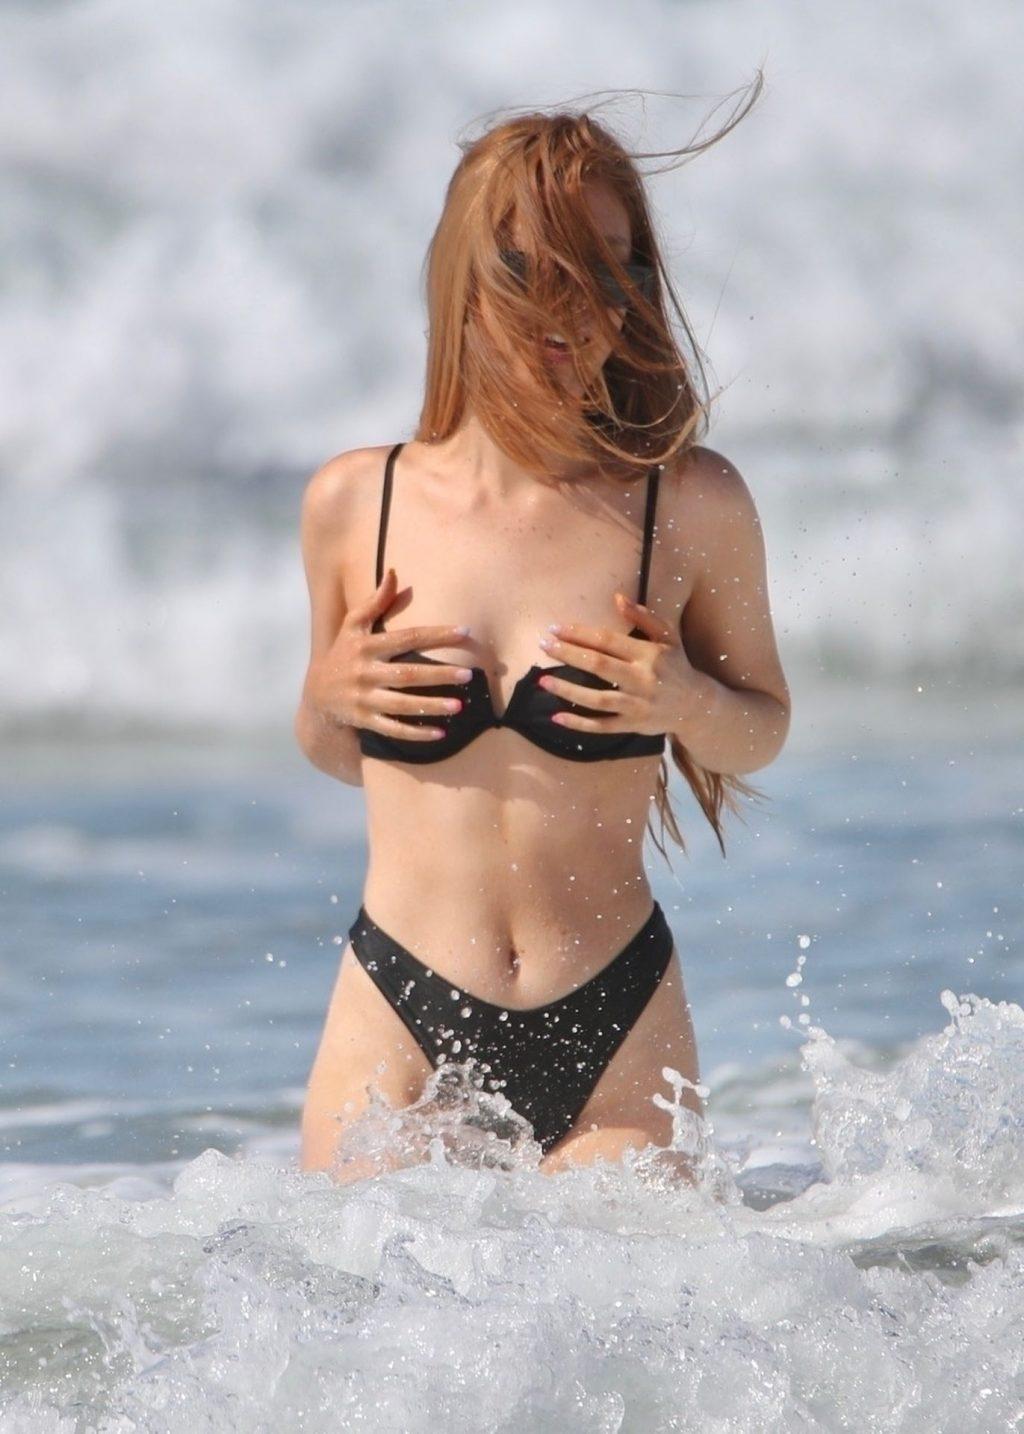 Zoe-Clare McDonald  nackt